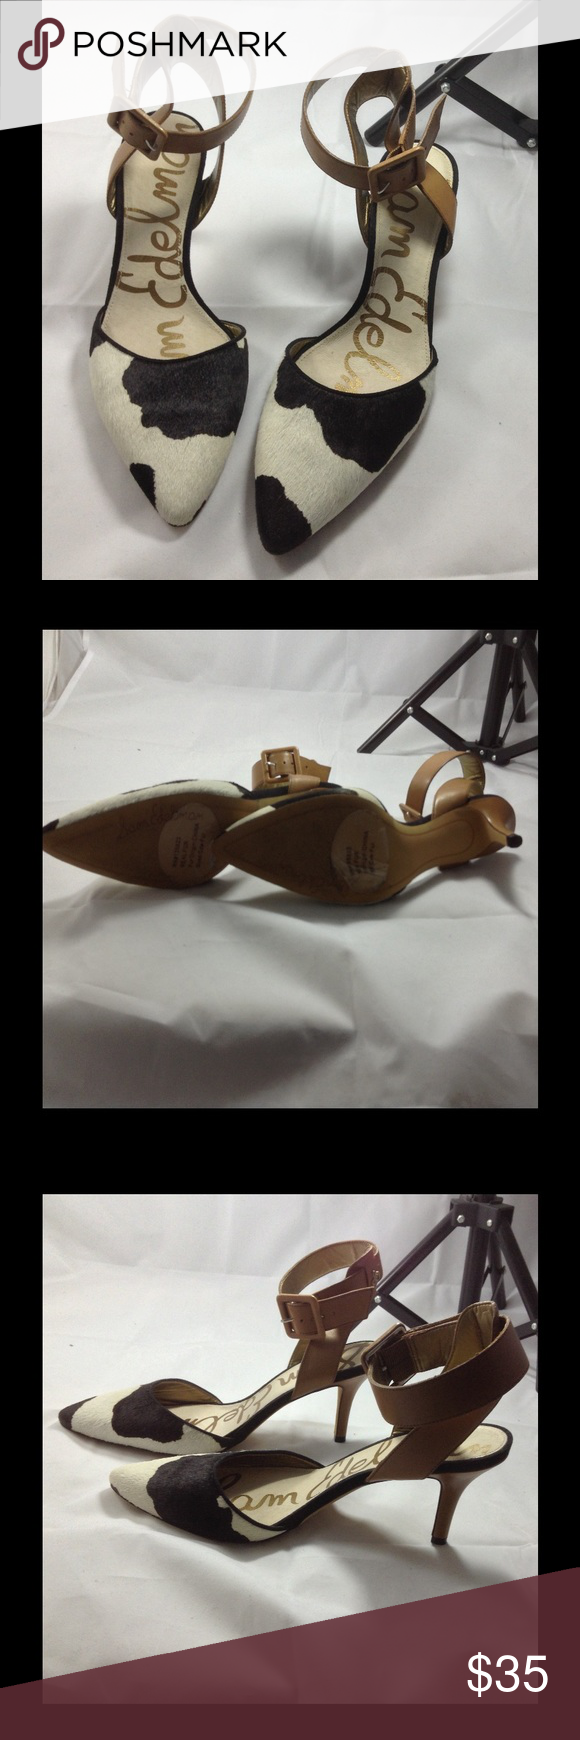 Sam Edelman heels Real cow fur, Sam Edelman, size 8, excellent condition. Sam Edelman Shoes Heels